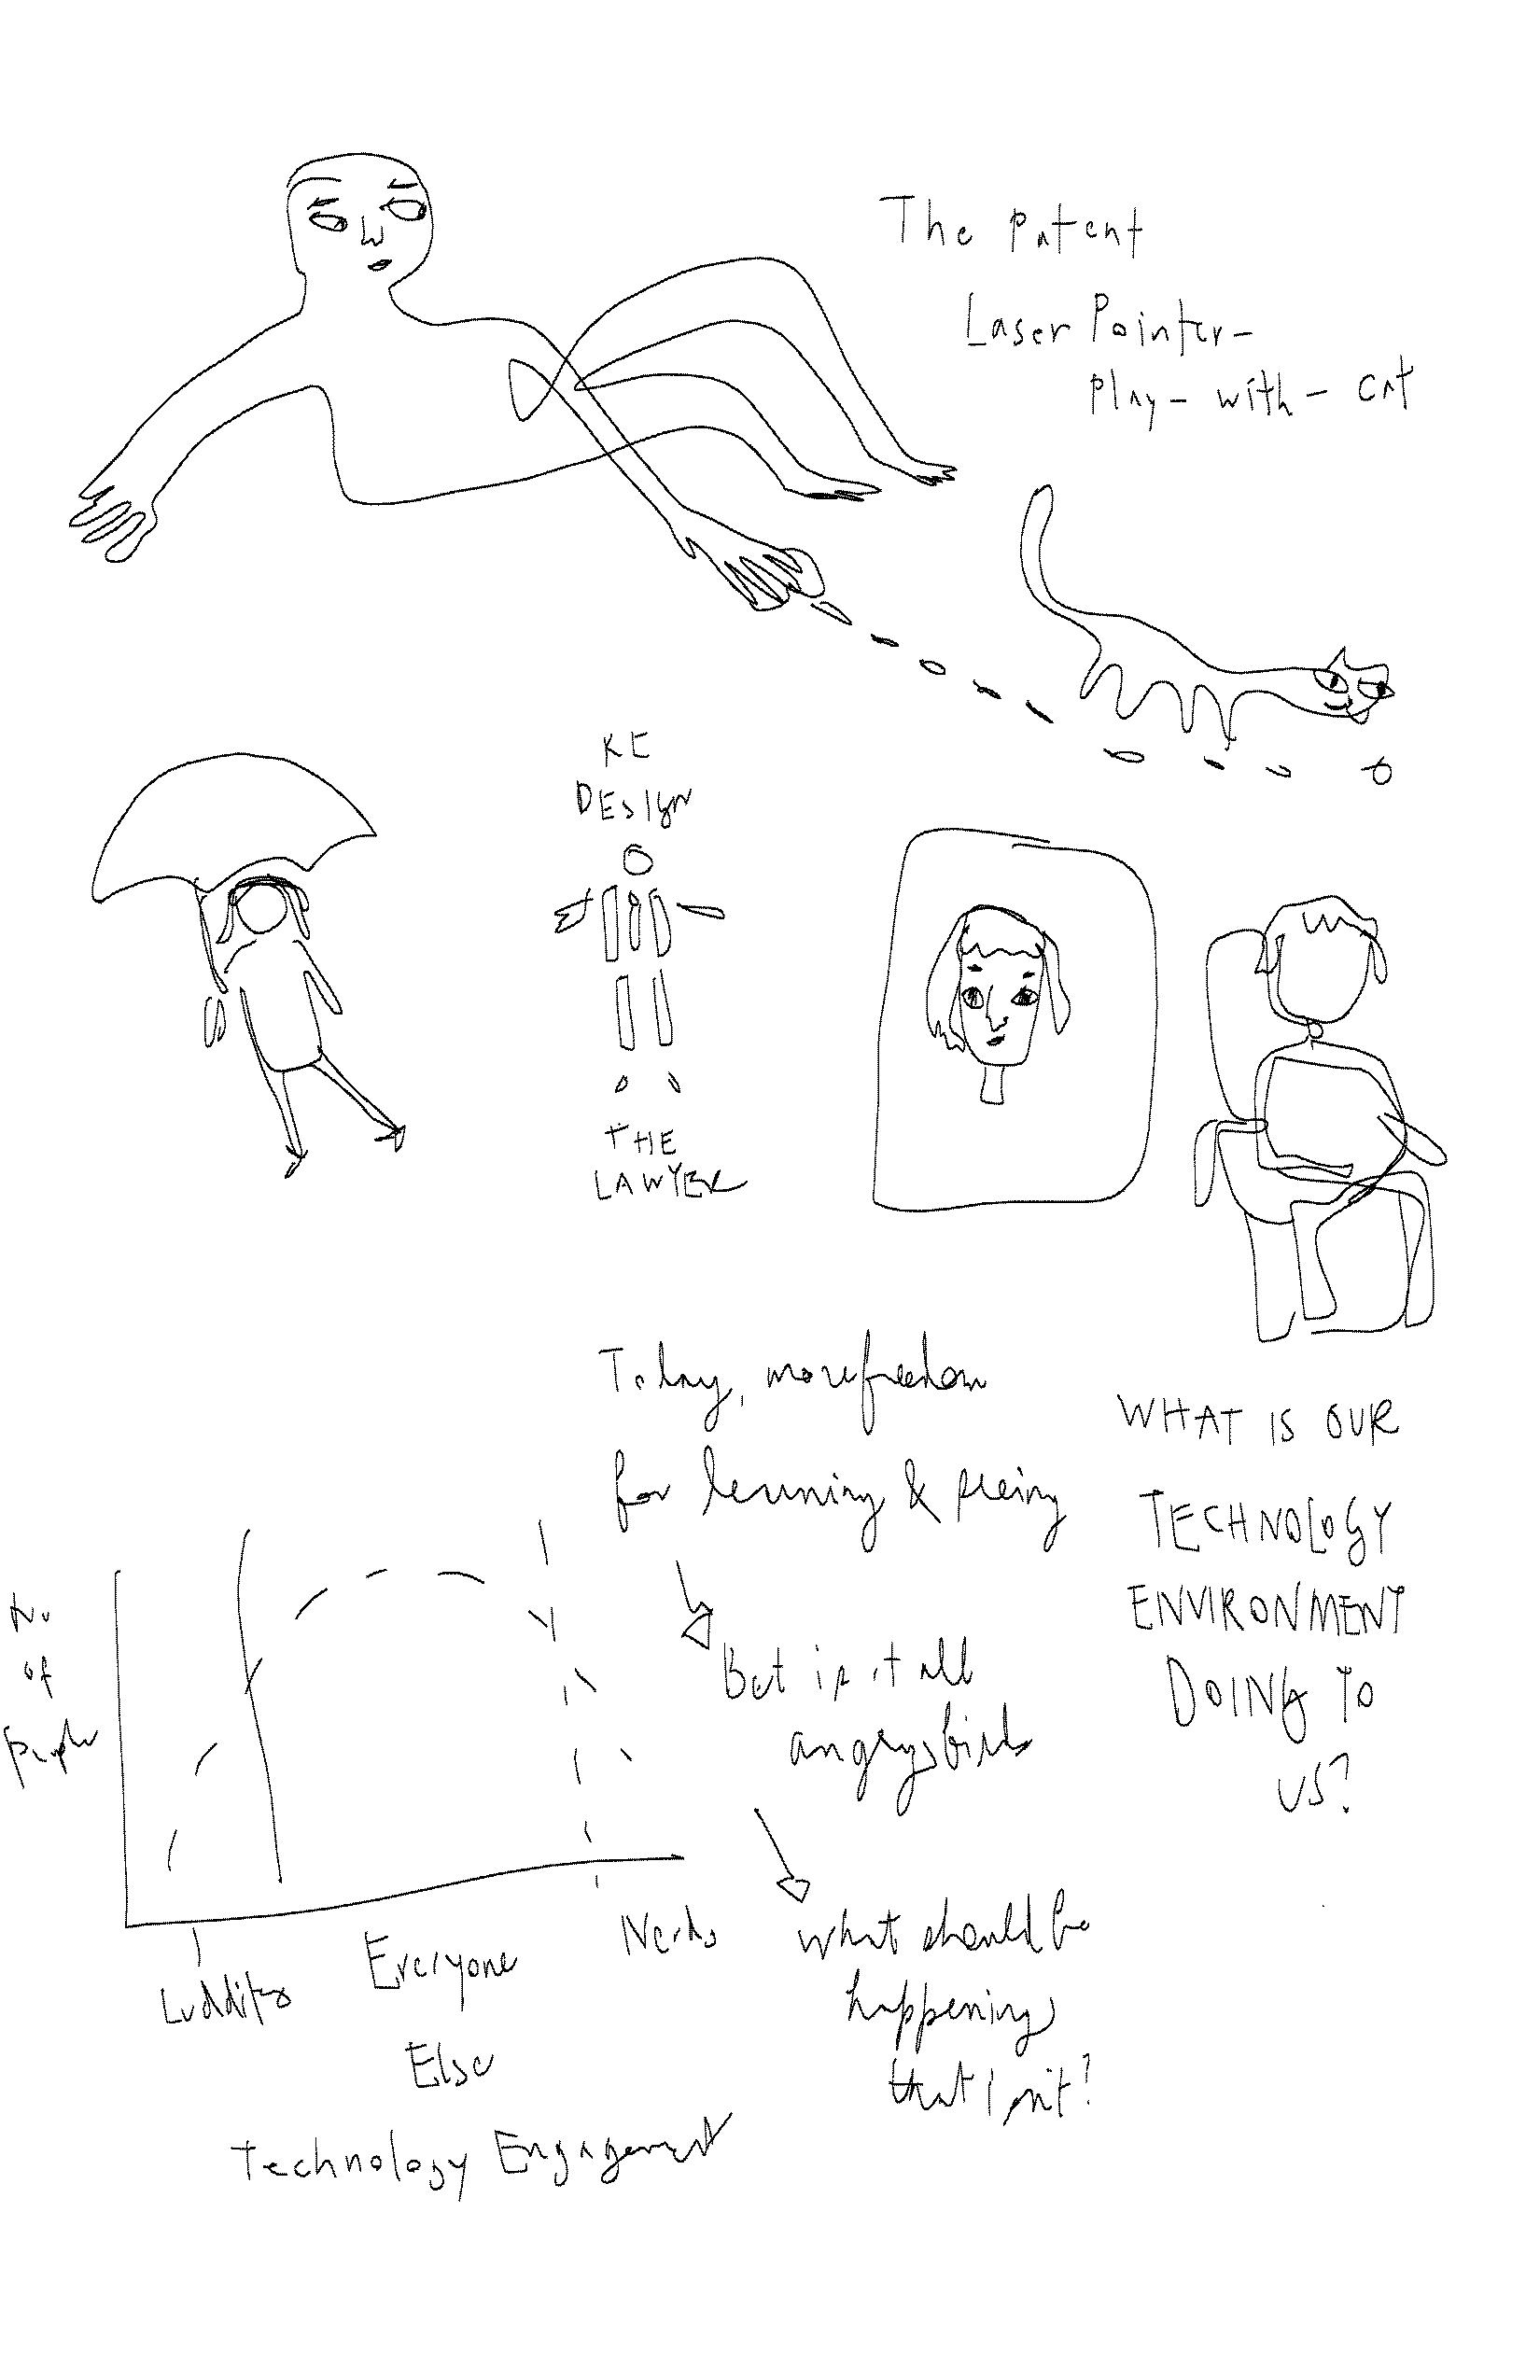 ilaw - sketches 2011 2